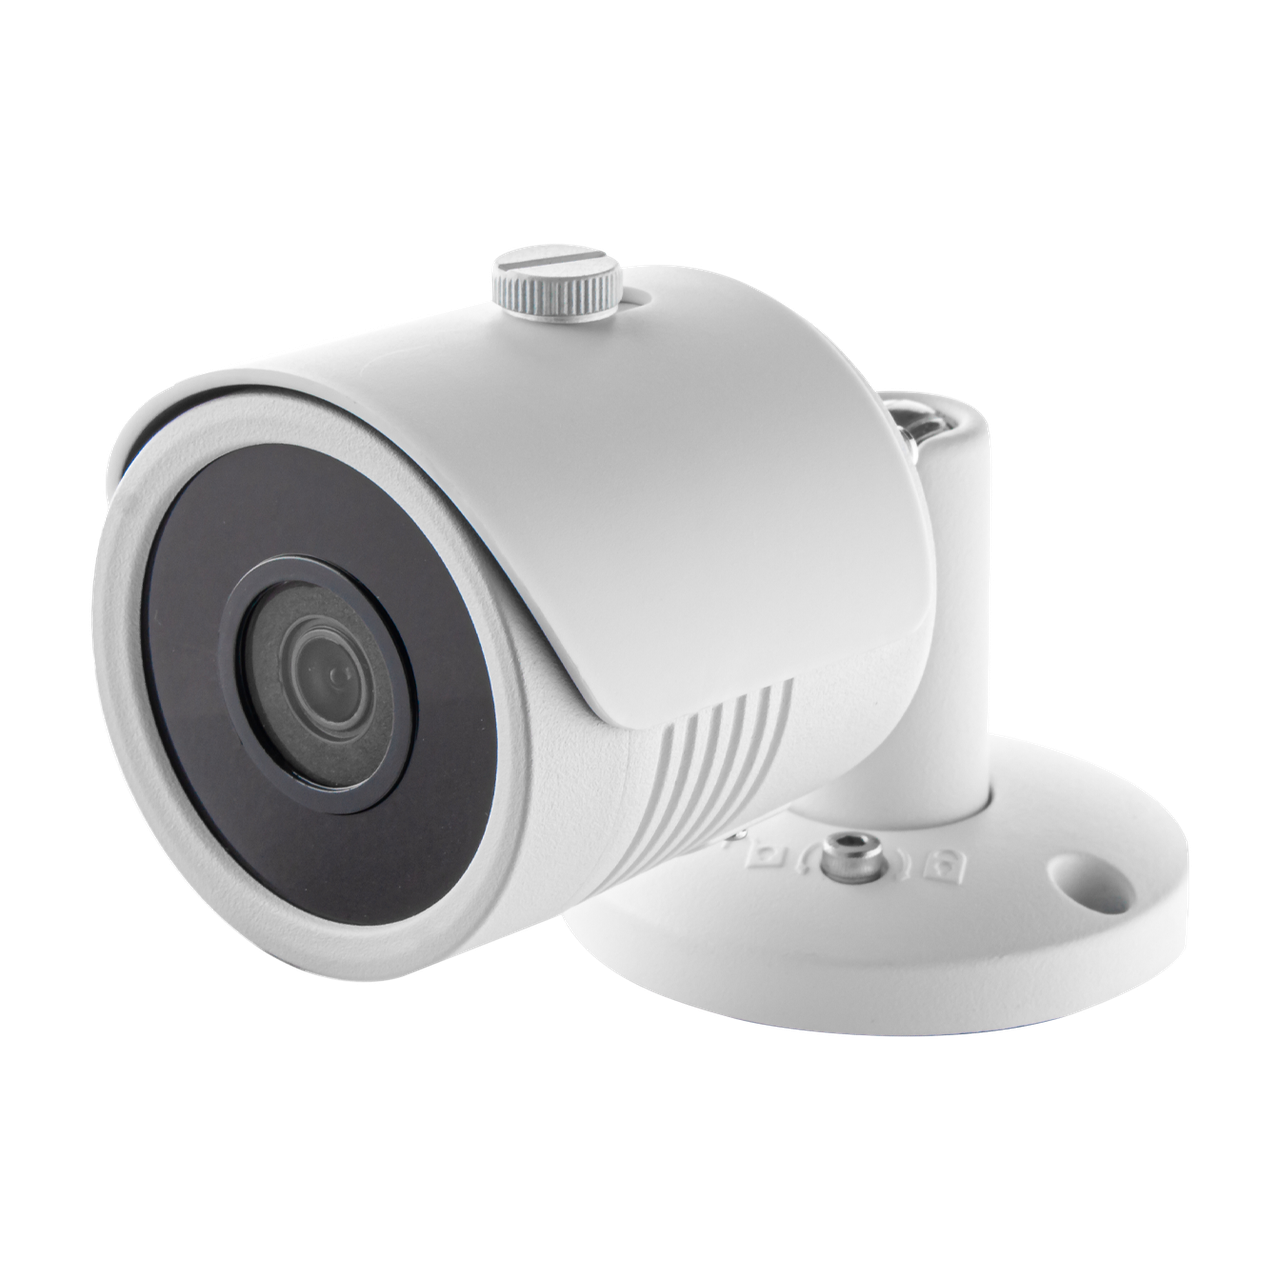 Наружная IP камера GreenVision GV-110-IP-E-СOF50-25 POE 5MP (Ultra)